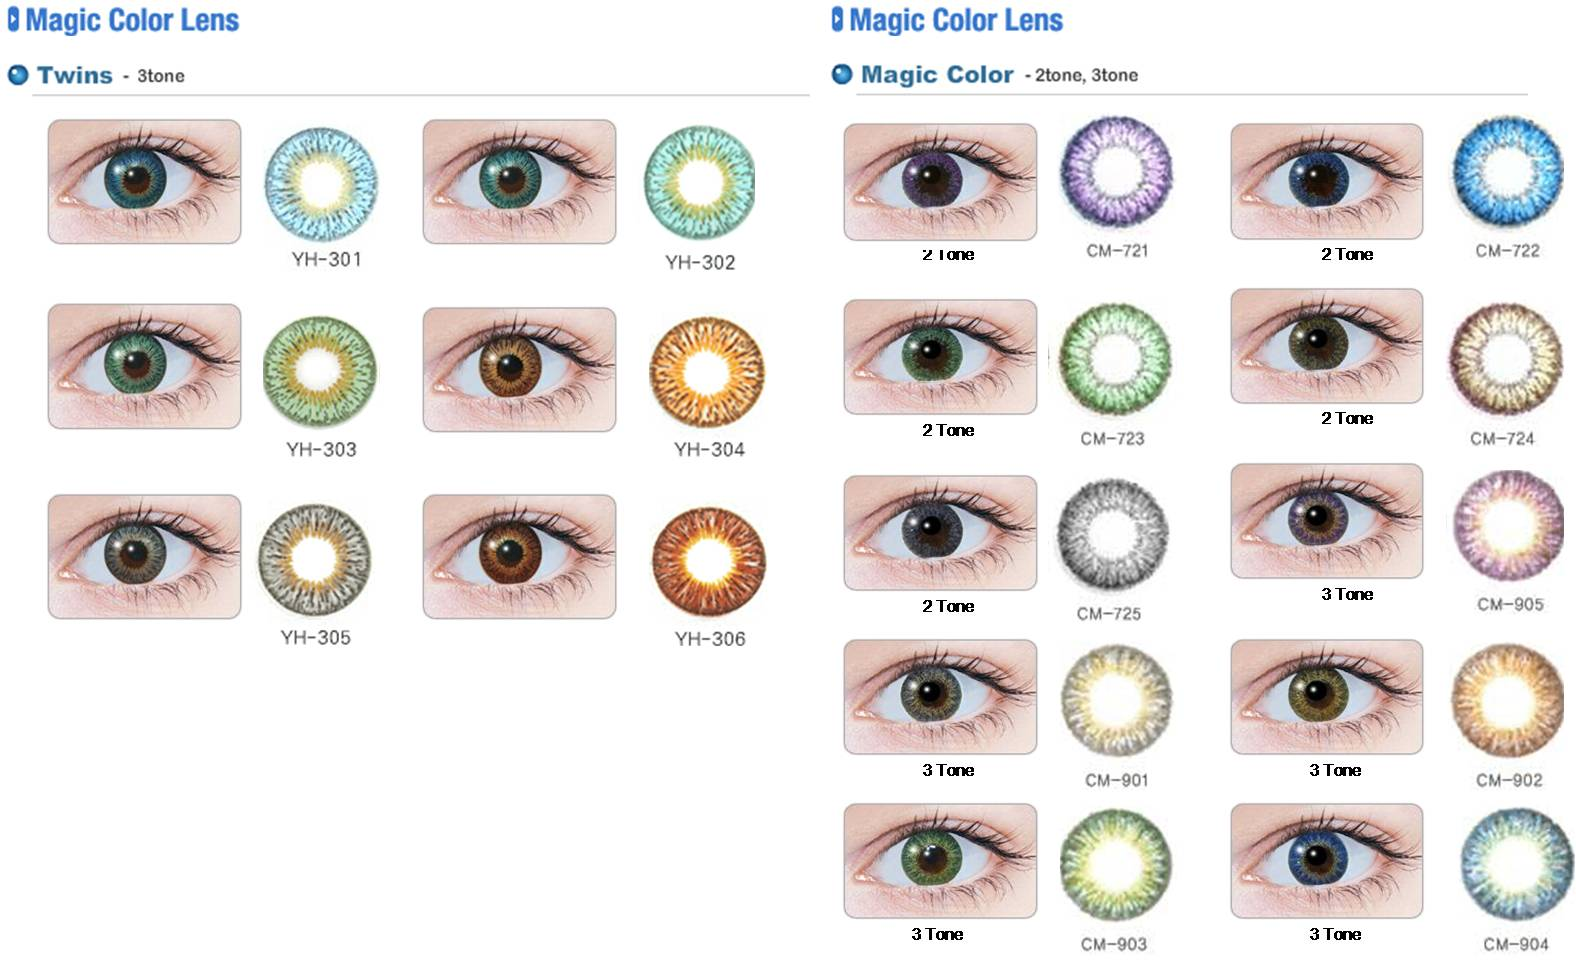 lentillas de colores - Lentilles Colores